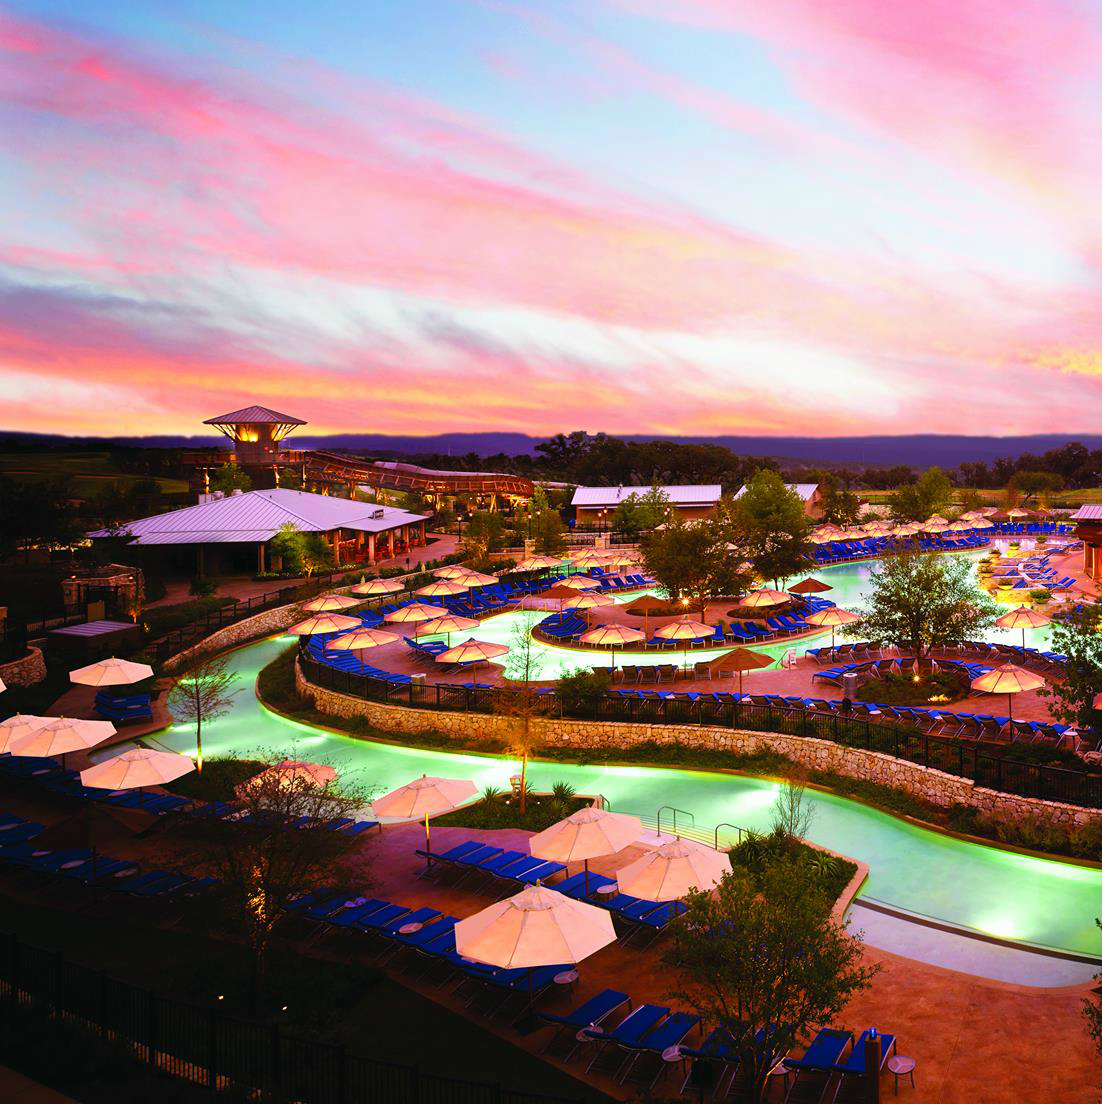 JW Marriott San Antonio Hill Country pool